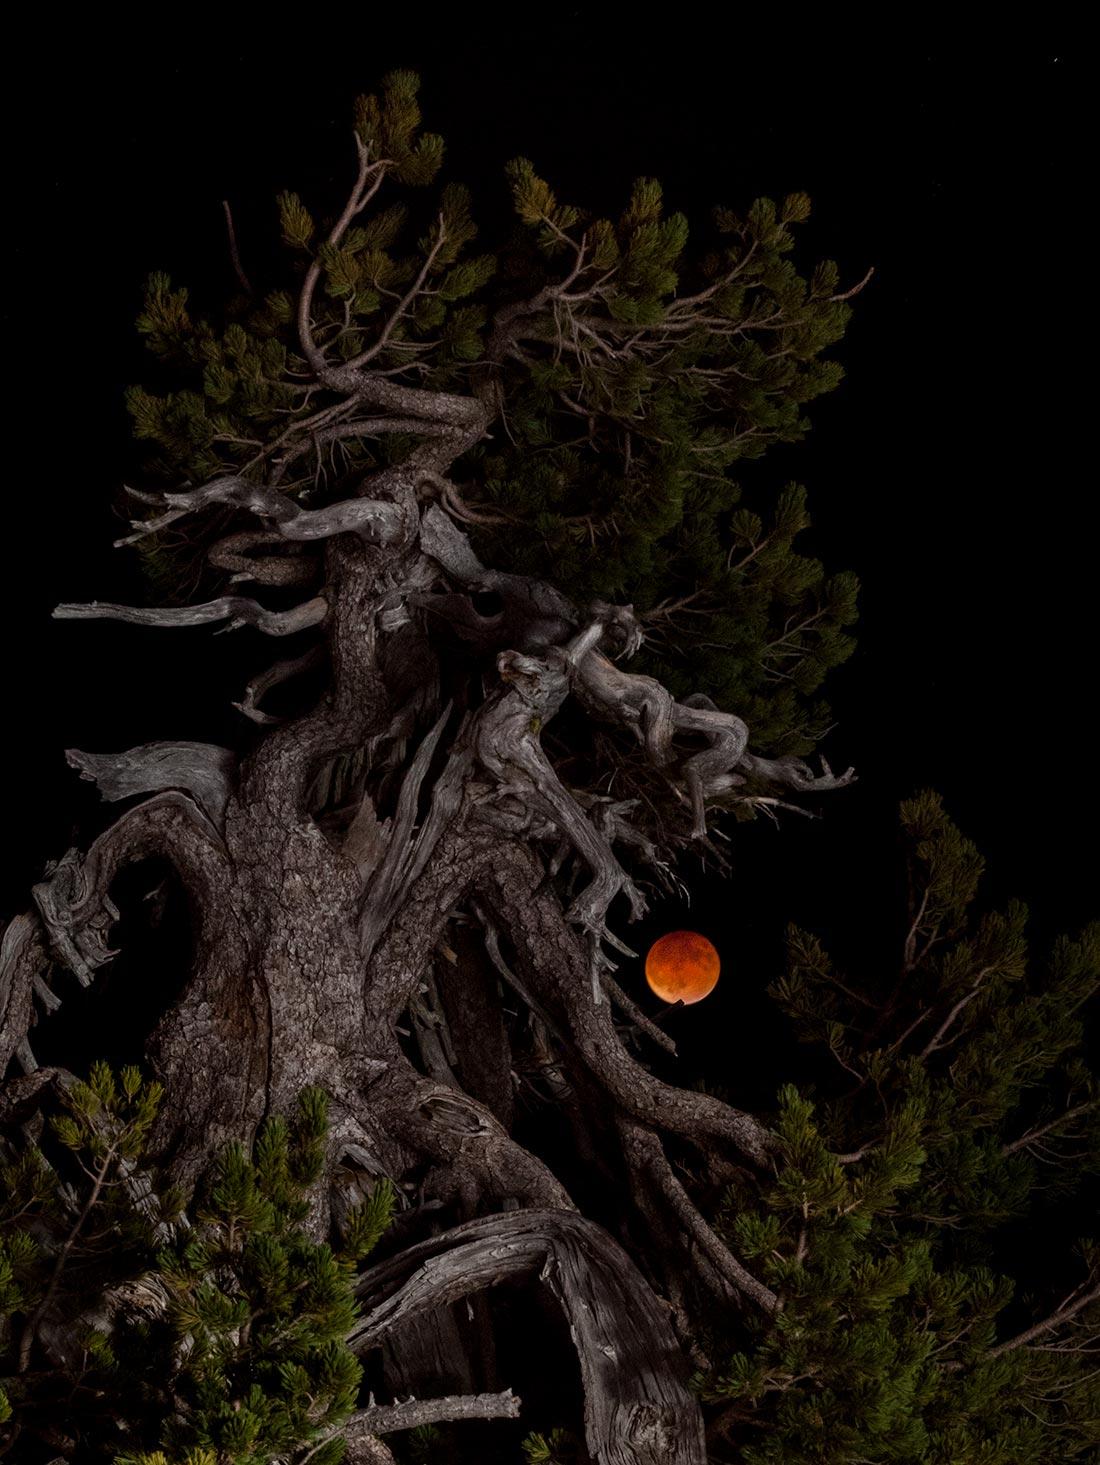 """Guardian of the Blood Moon"" by Joaquin Baldwin"